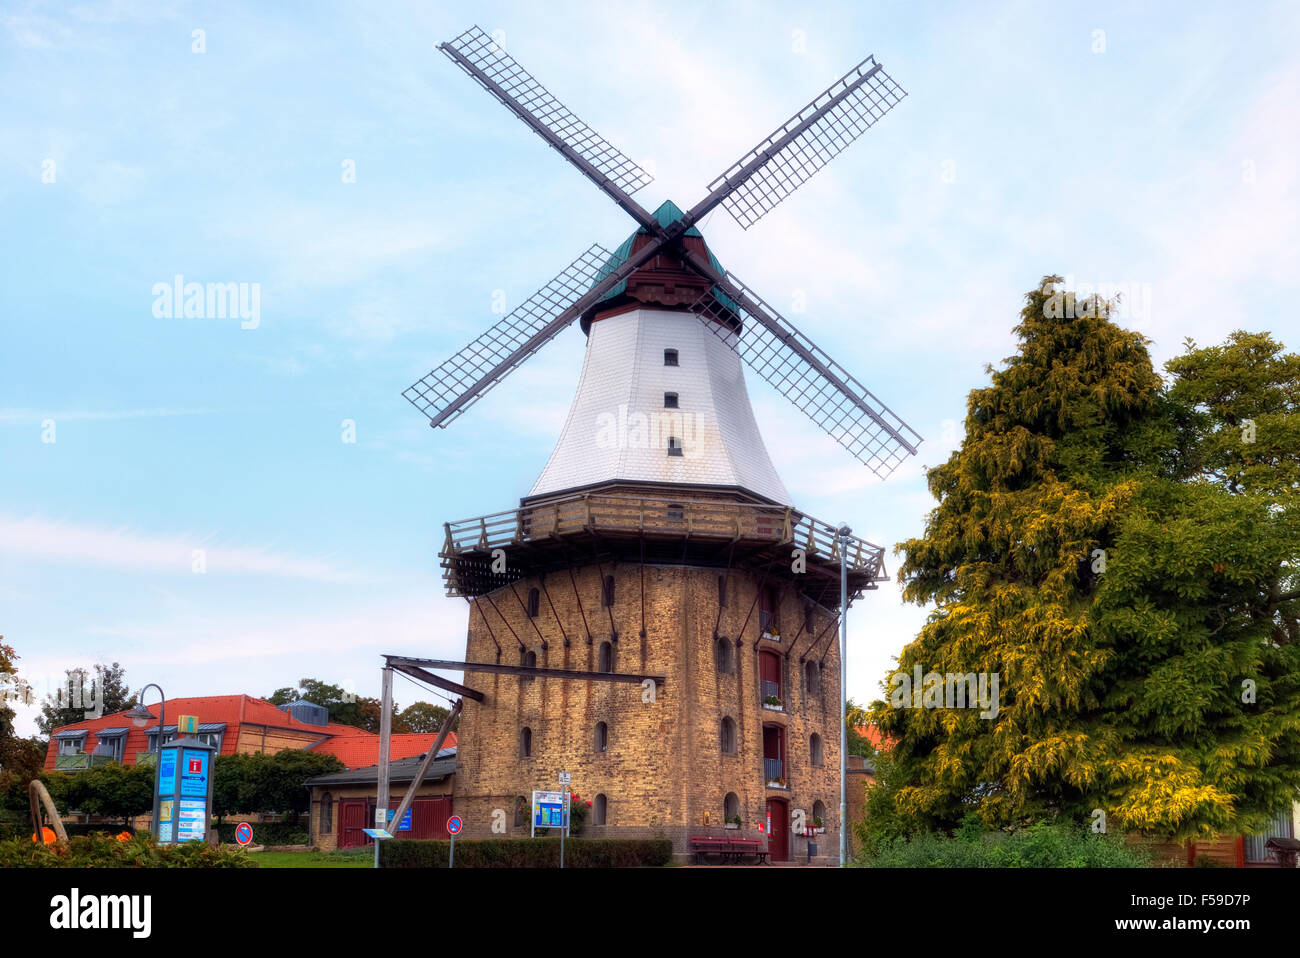 windmill Amanda, Kappeln, Schlei, Schleswig-Holstein, Germany - Stock Image